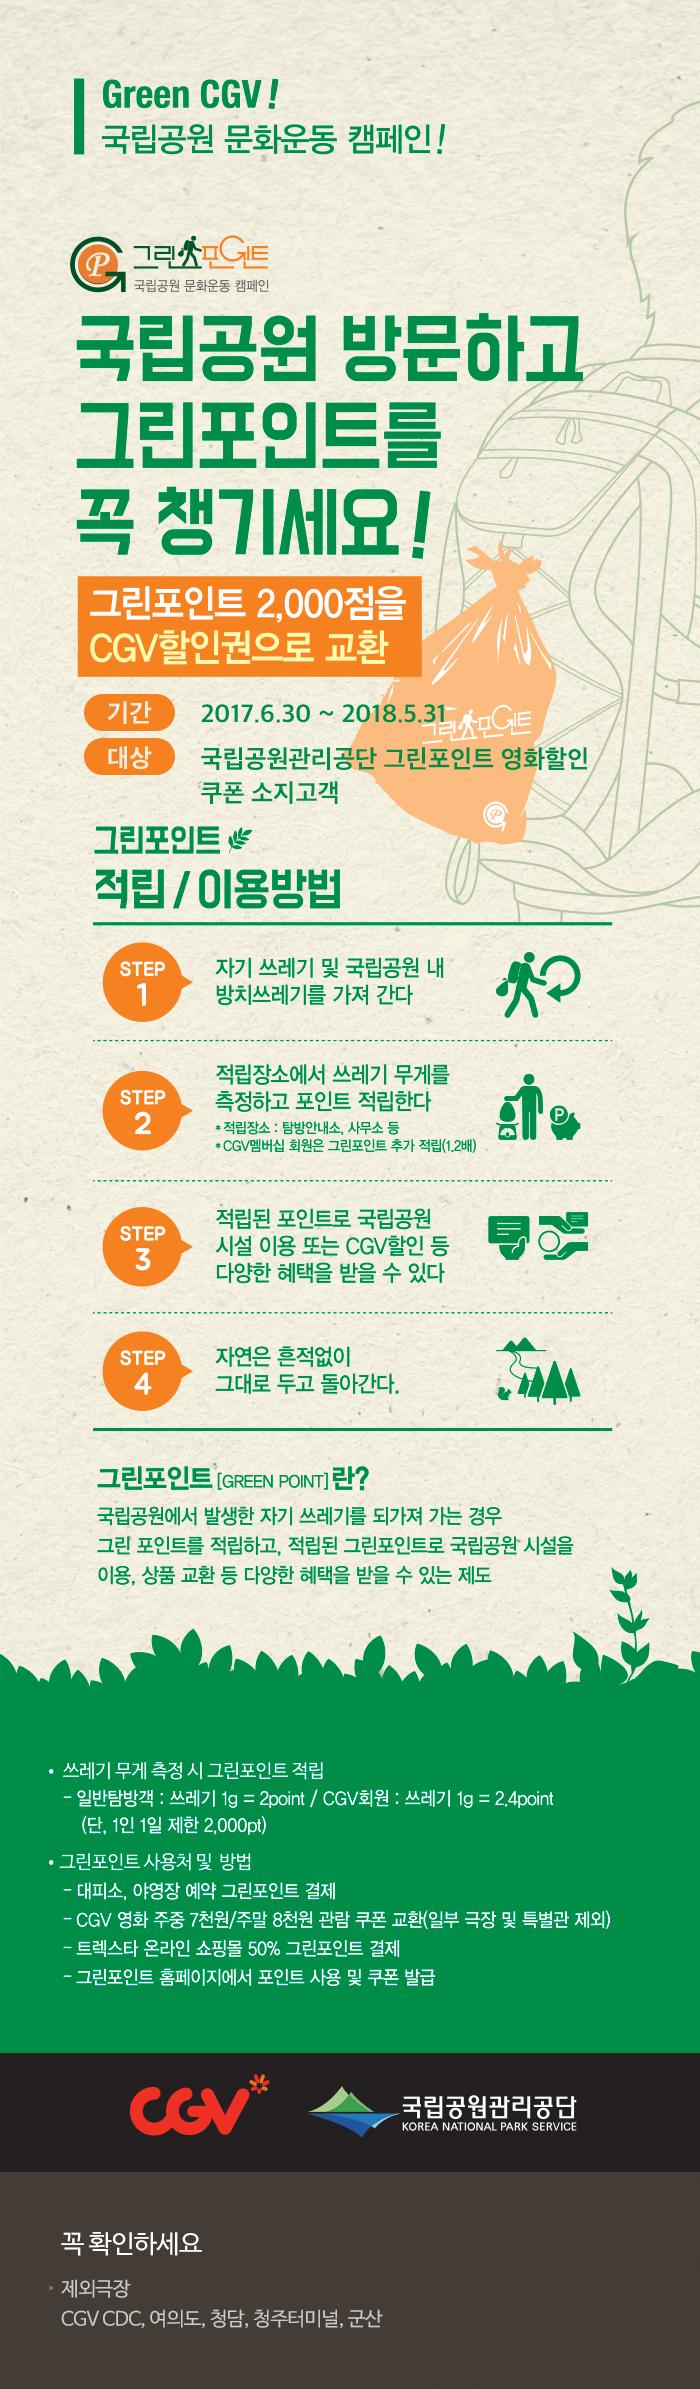 CGV극장별 국립공원 문화운동 캠페인_그린포인트2,000점을 CGV할인권으로 교환